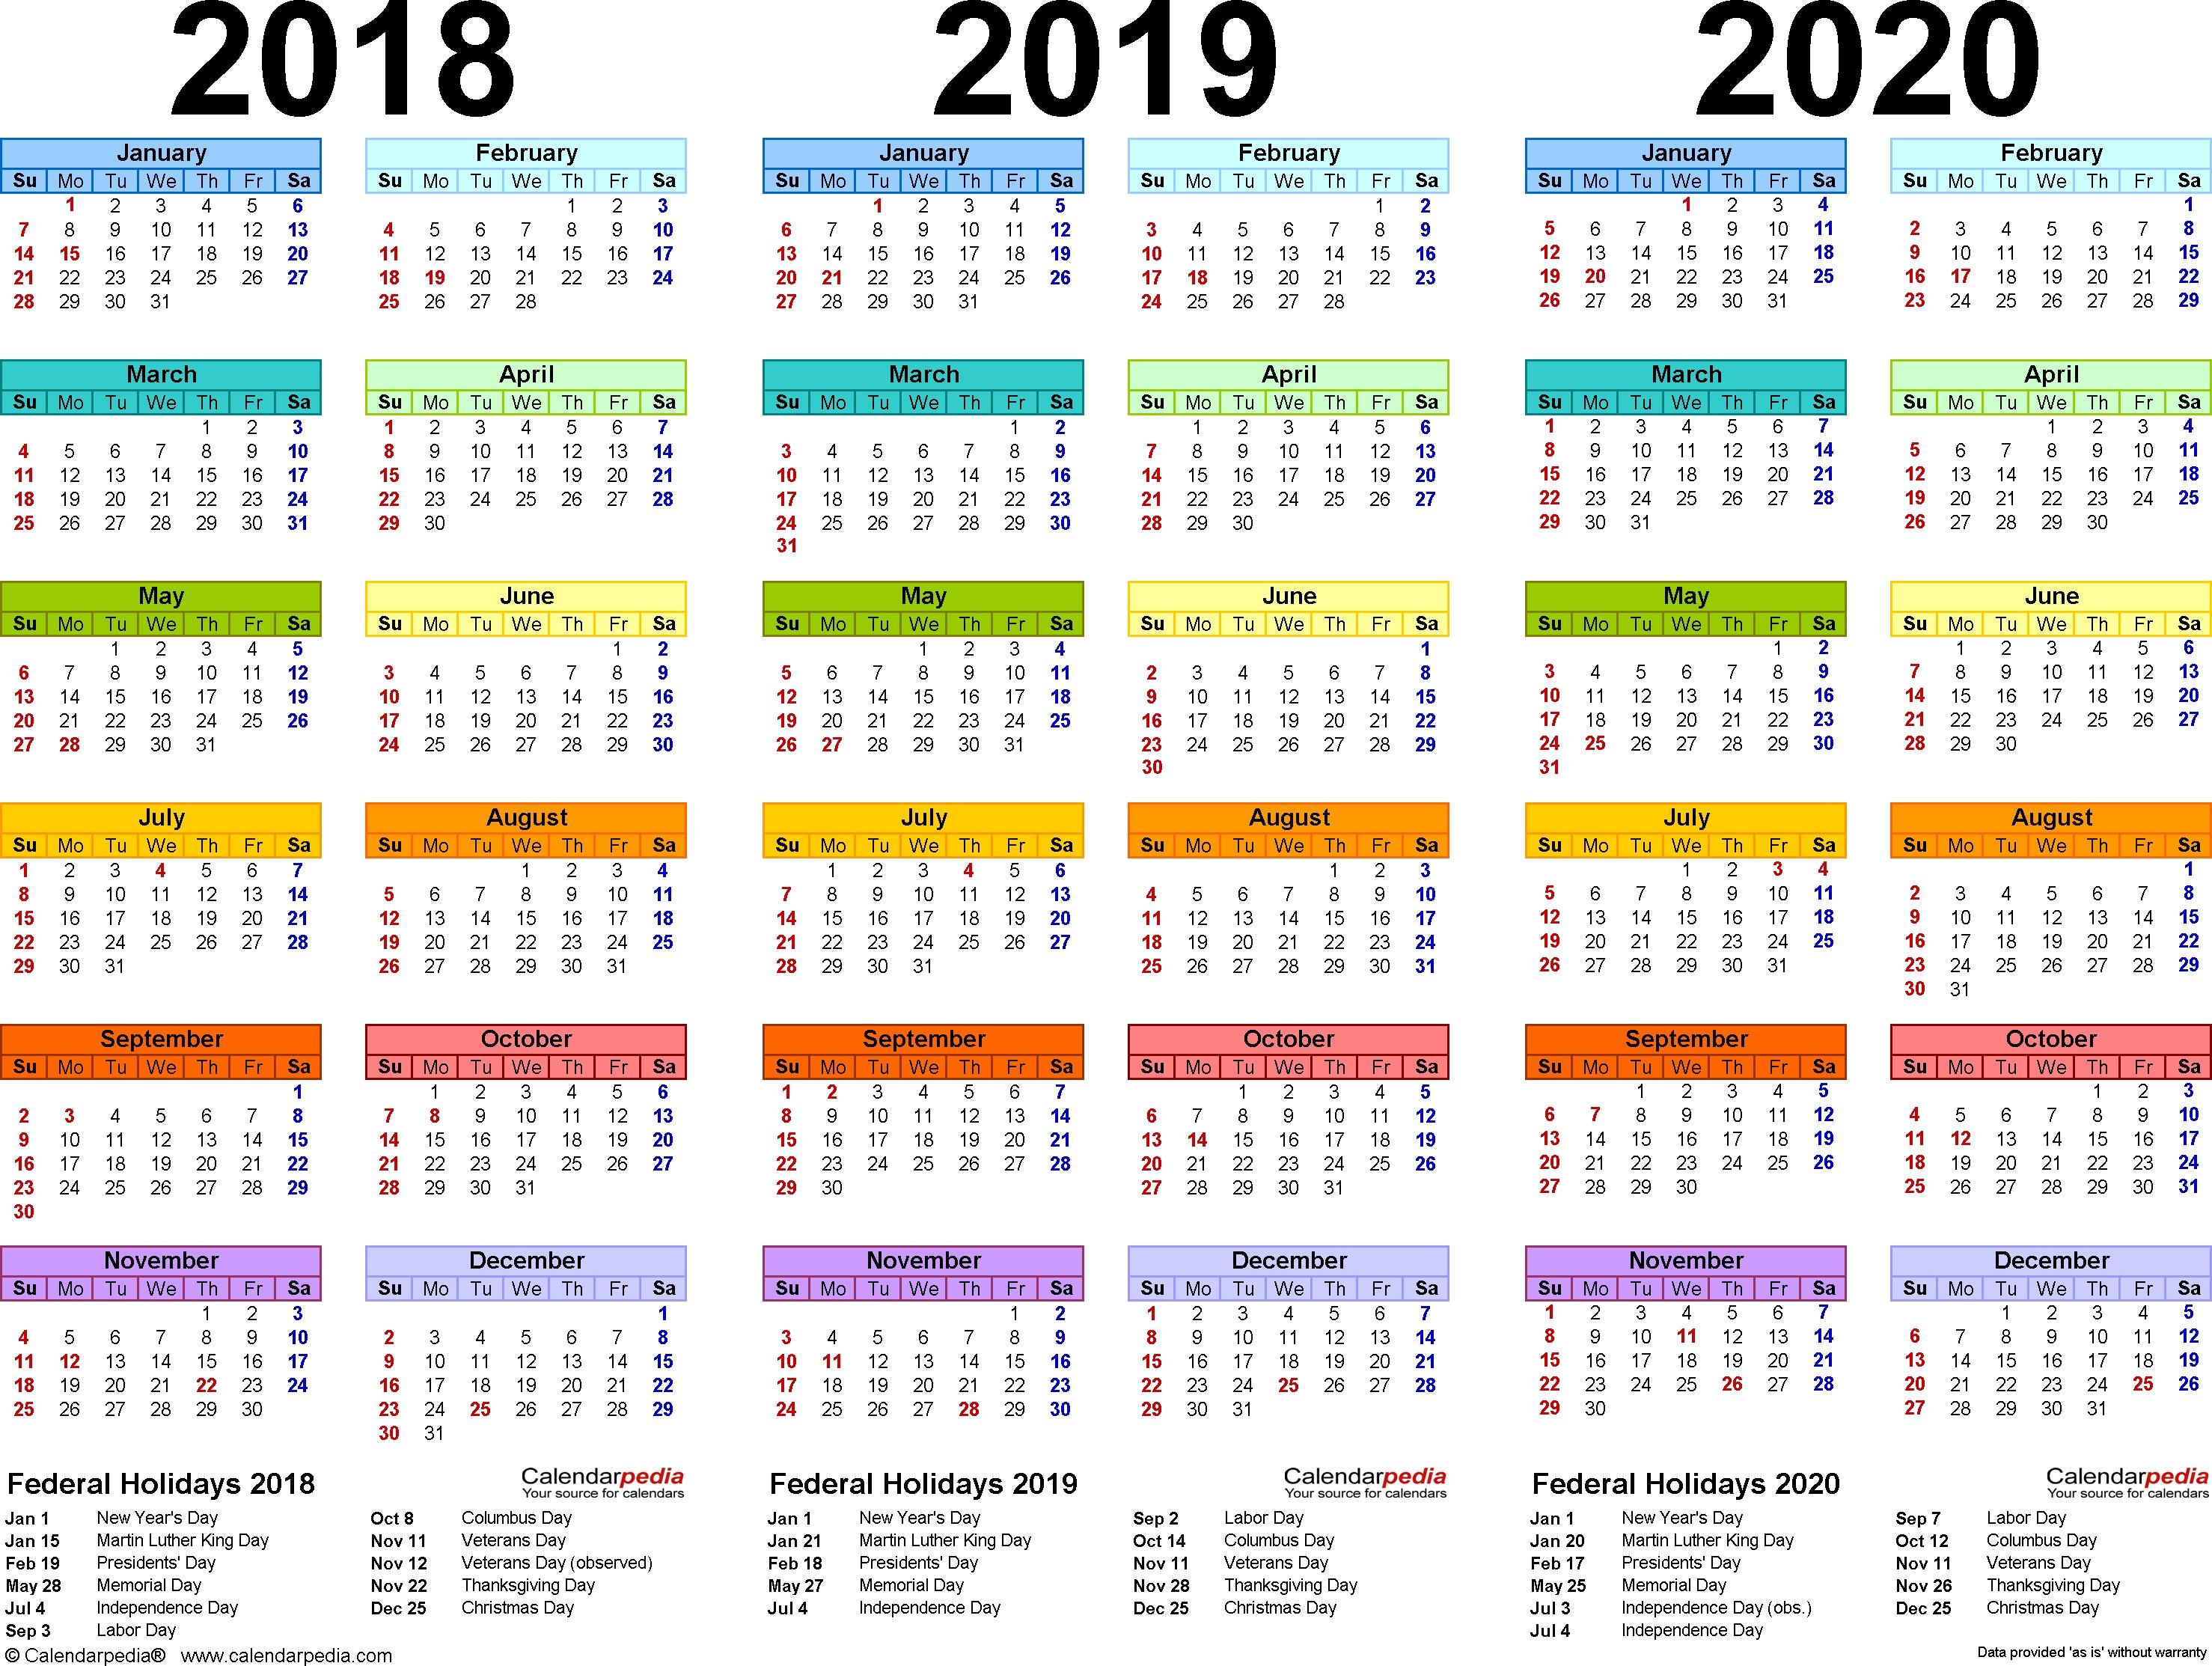 Printable 3 Year Calendar 2019 To 2021 | Printable Calendar 2019 regarding Printable 3 Year Calendar 2019 2020 2021